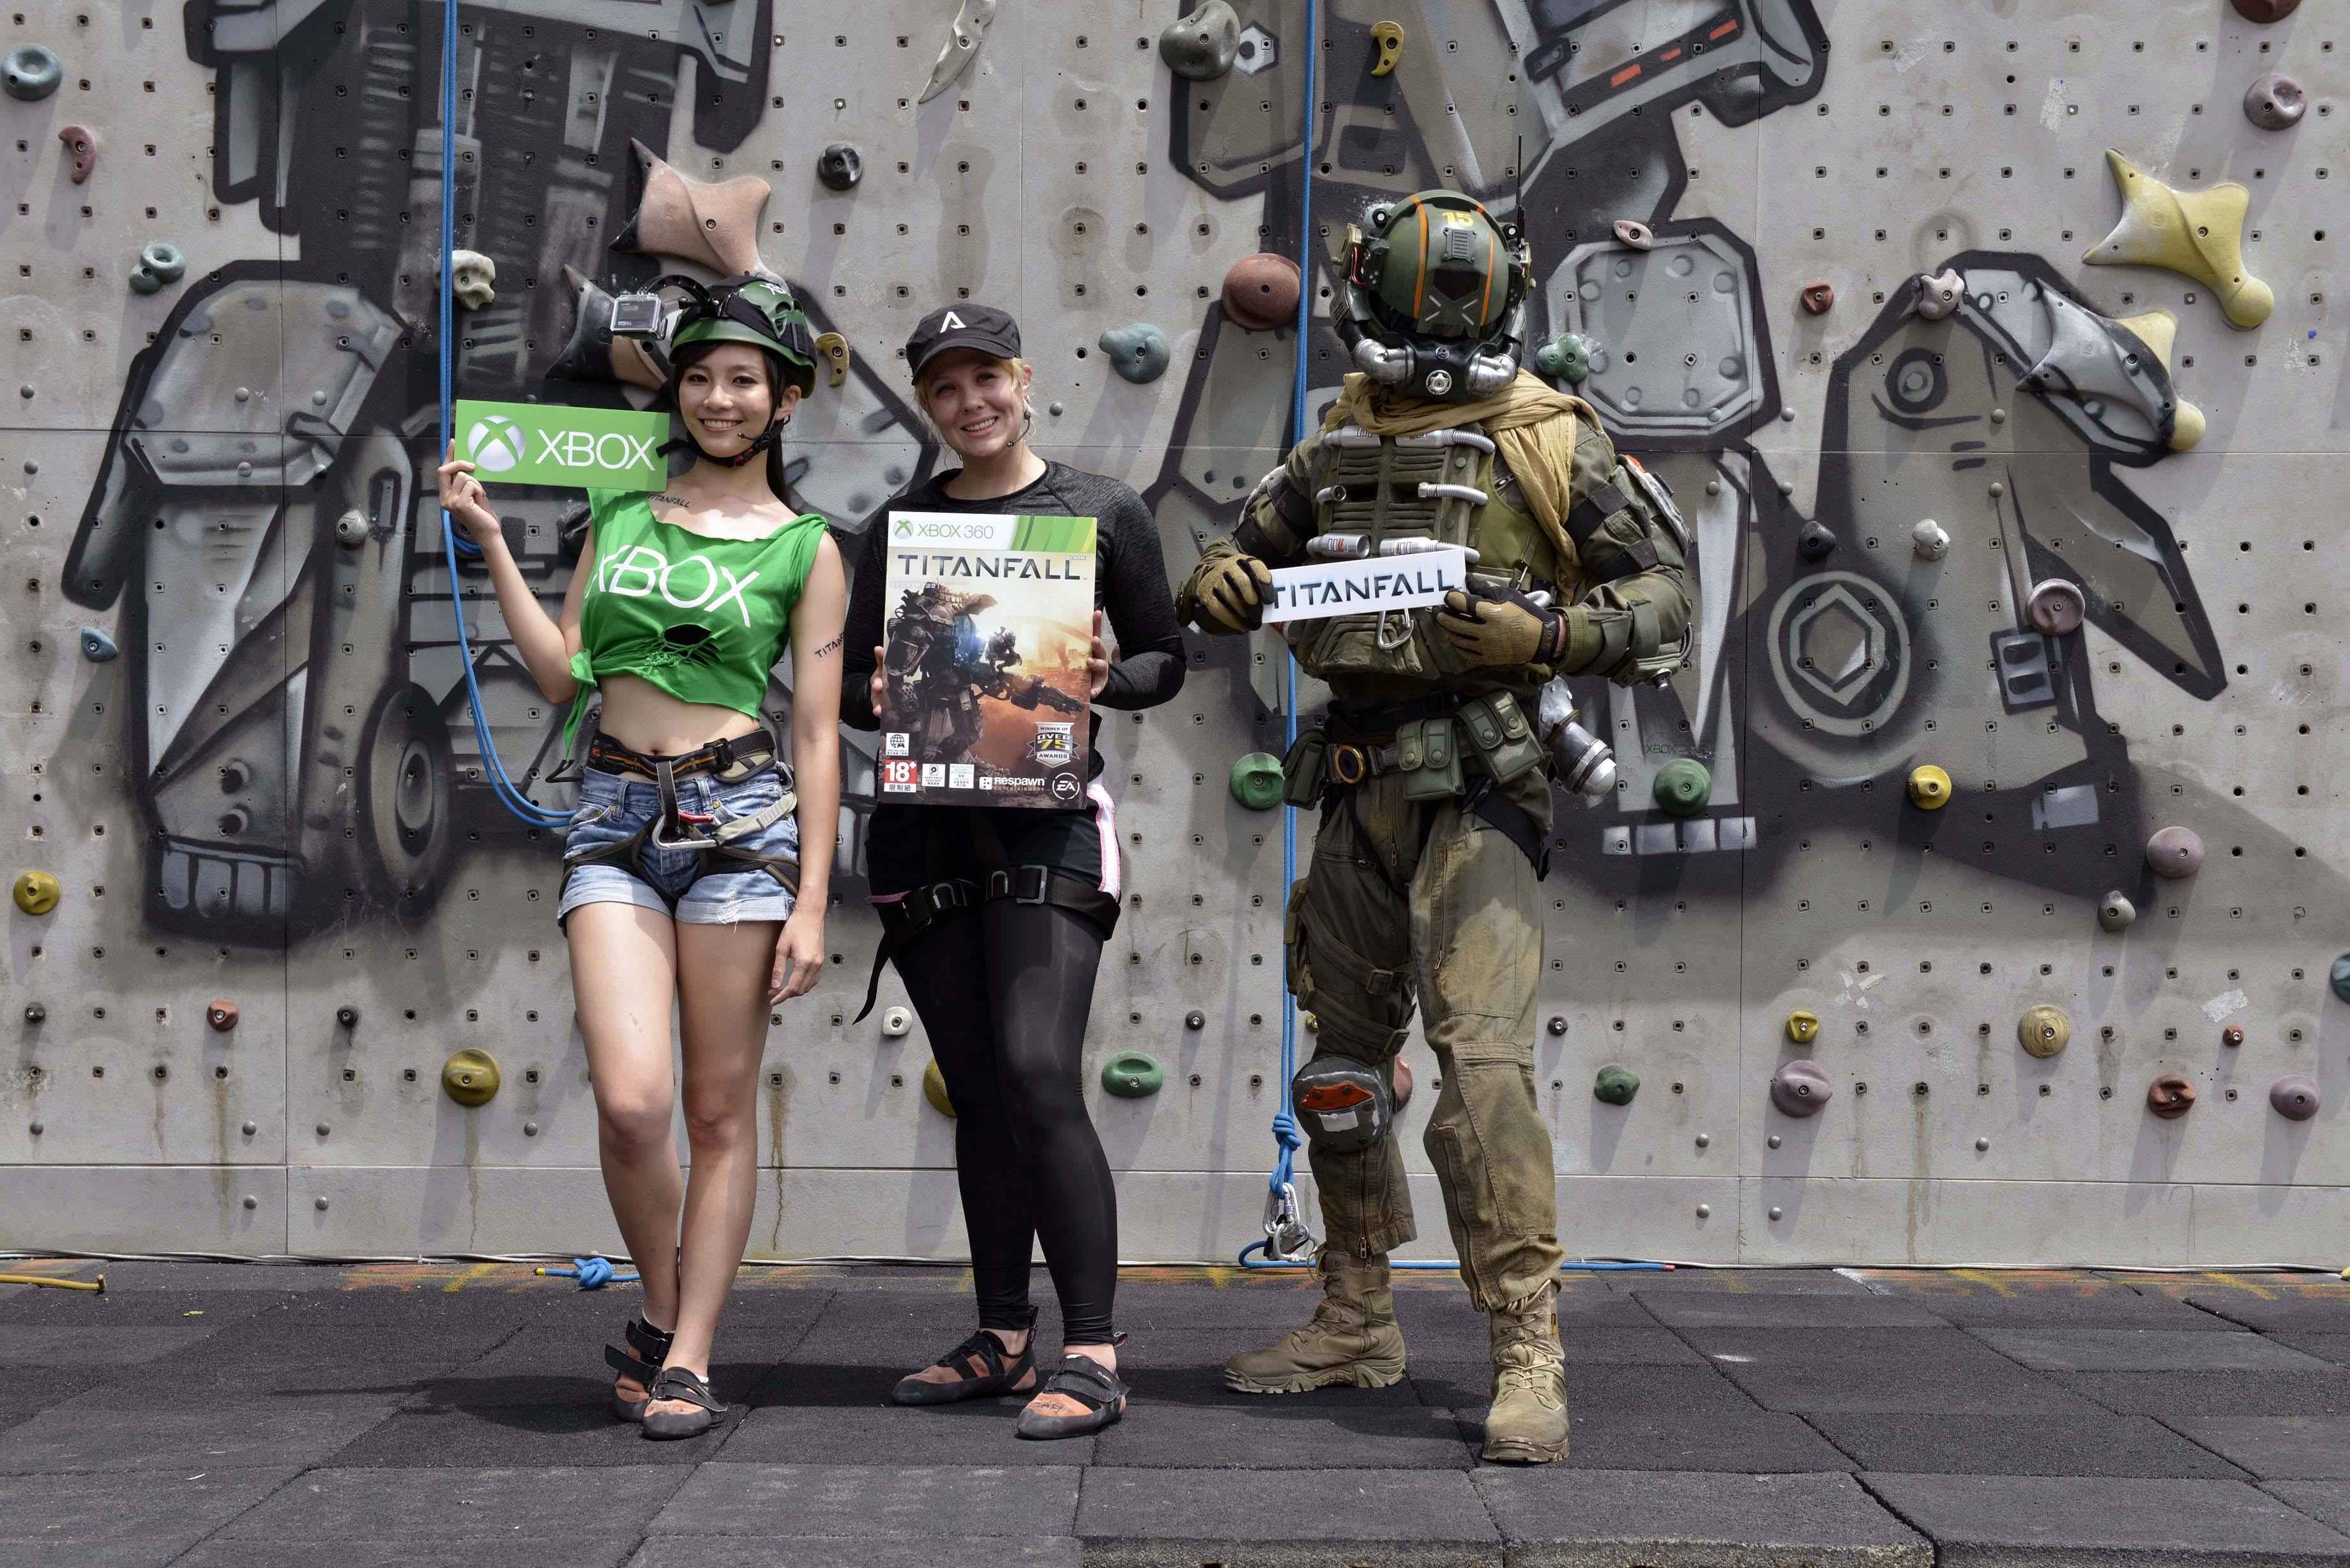 《TITANFALL》Xbox 360中文版4月8日在台上市。